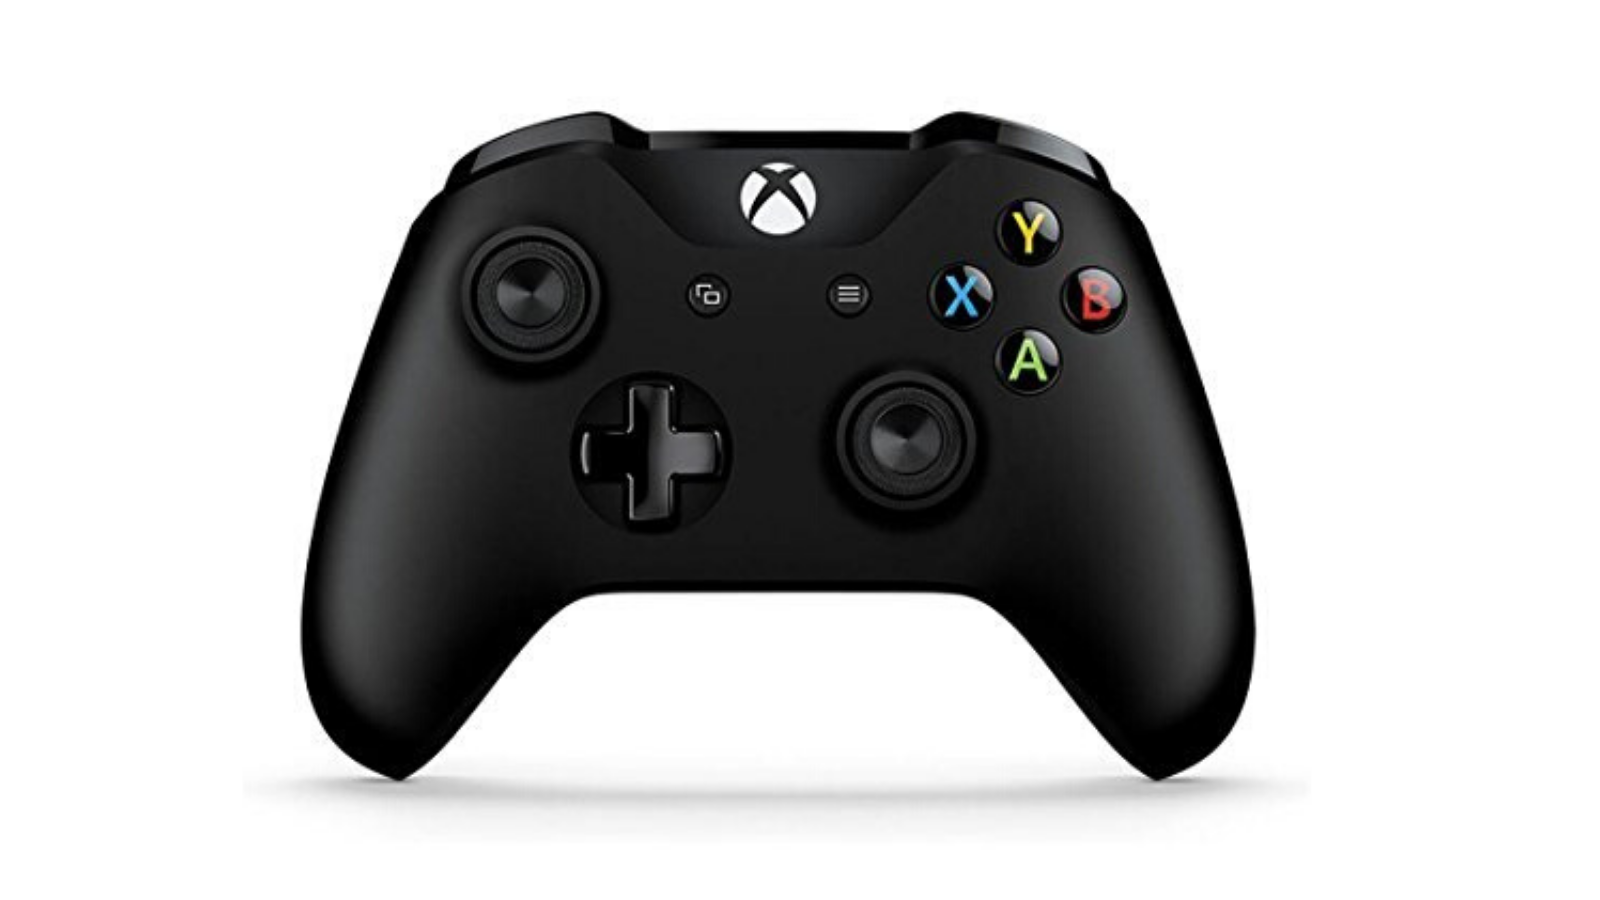 A black Xbox One wireless controller.